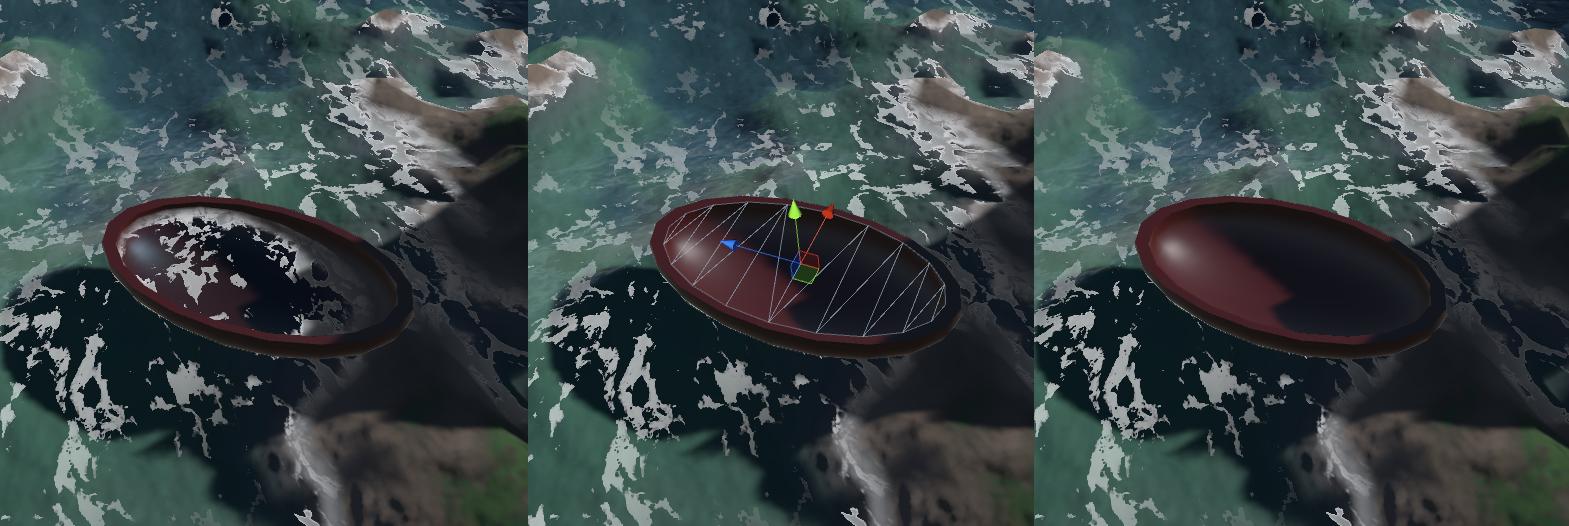 Assassin's Creed: Black Flag – Waterplane | Simon schreibt